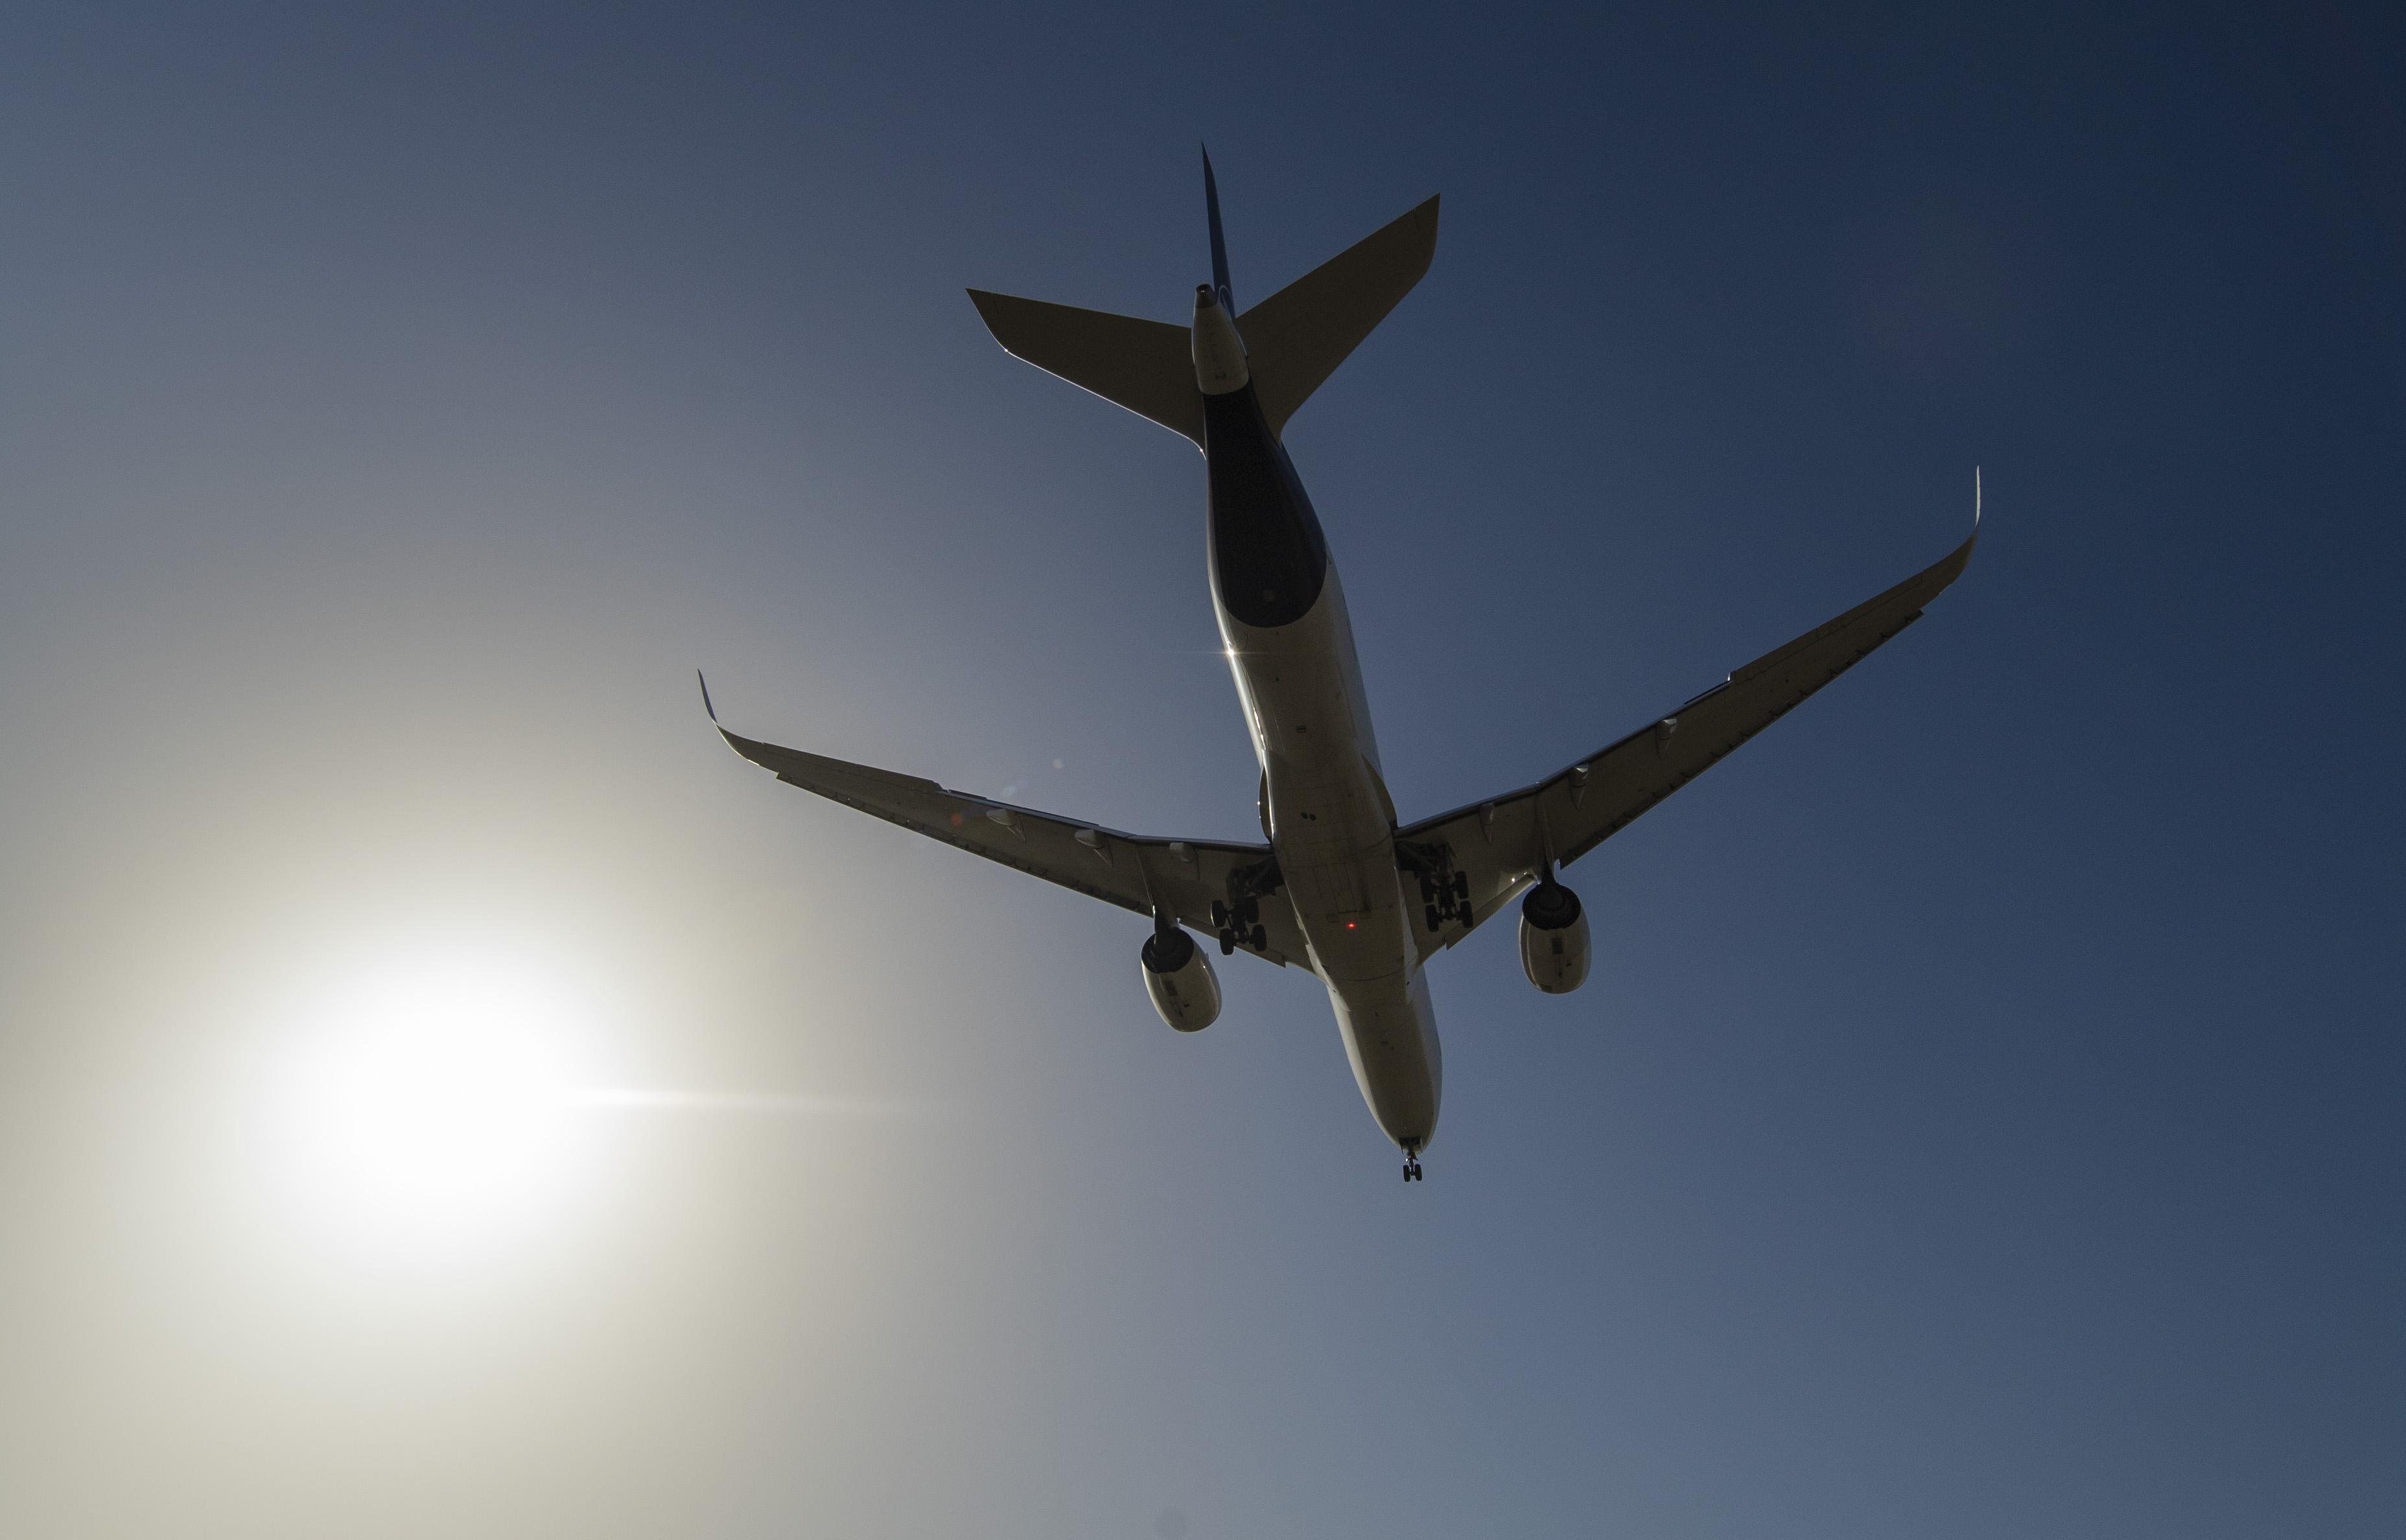 Disturbance of air traffic by drones